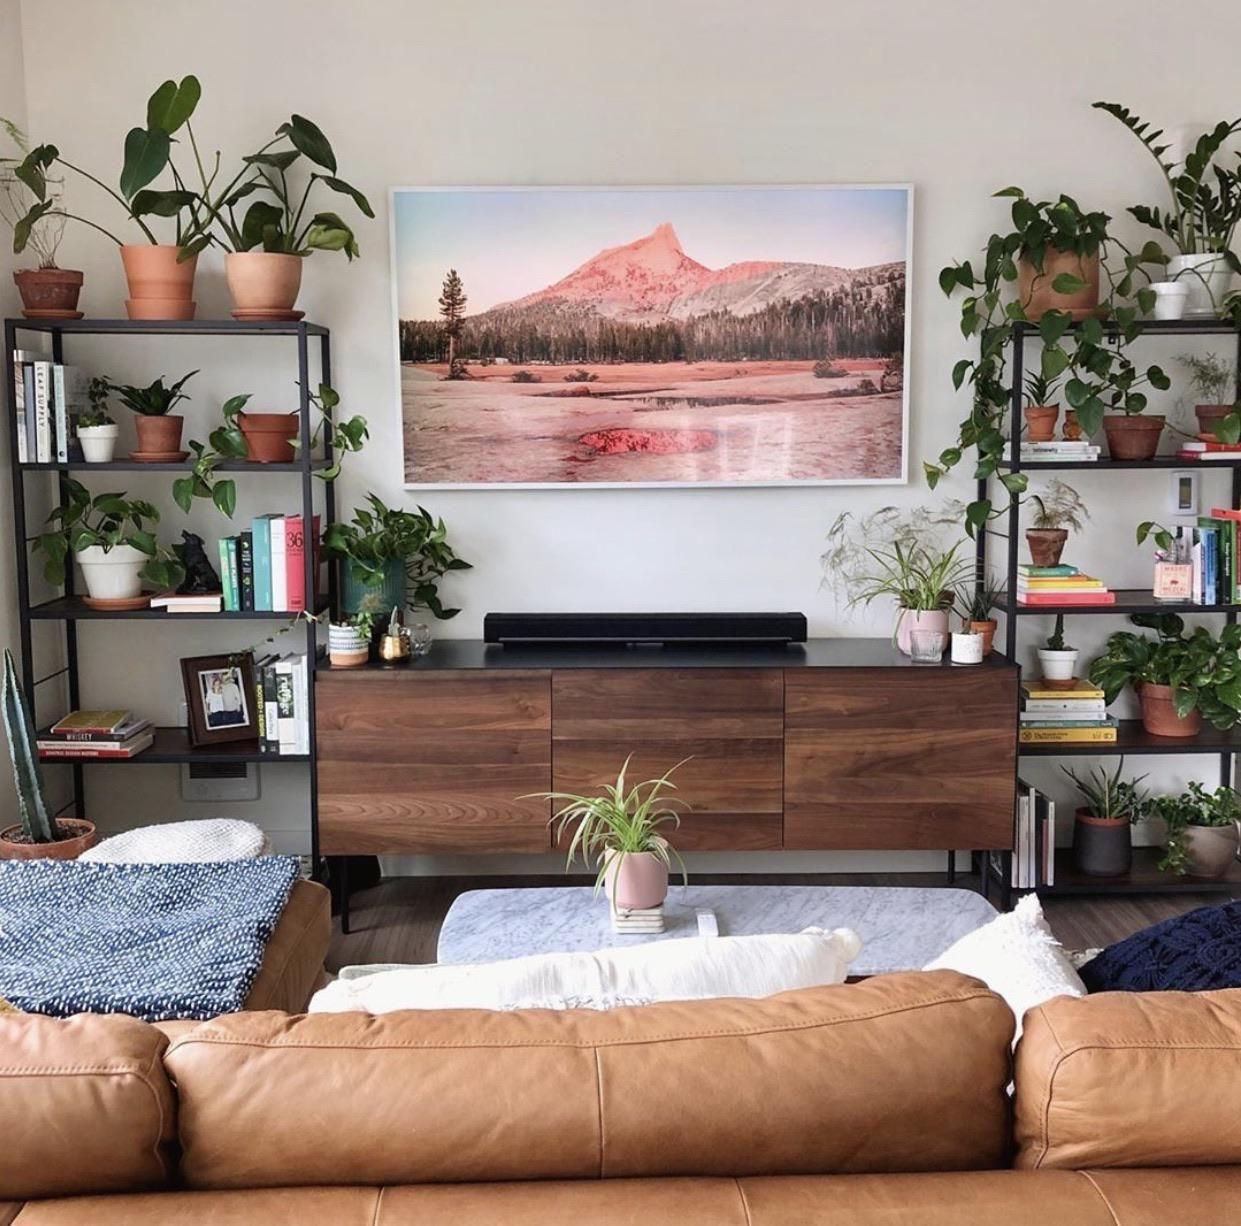 US $21.46 47% OFF Delivery normal DIY Non woven fold Portable Storage furniture When the quarter wardrobe Cabinet bedroom furniture wardrobe Wardrobes  - AliExpress